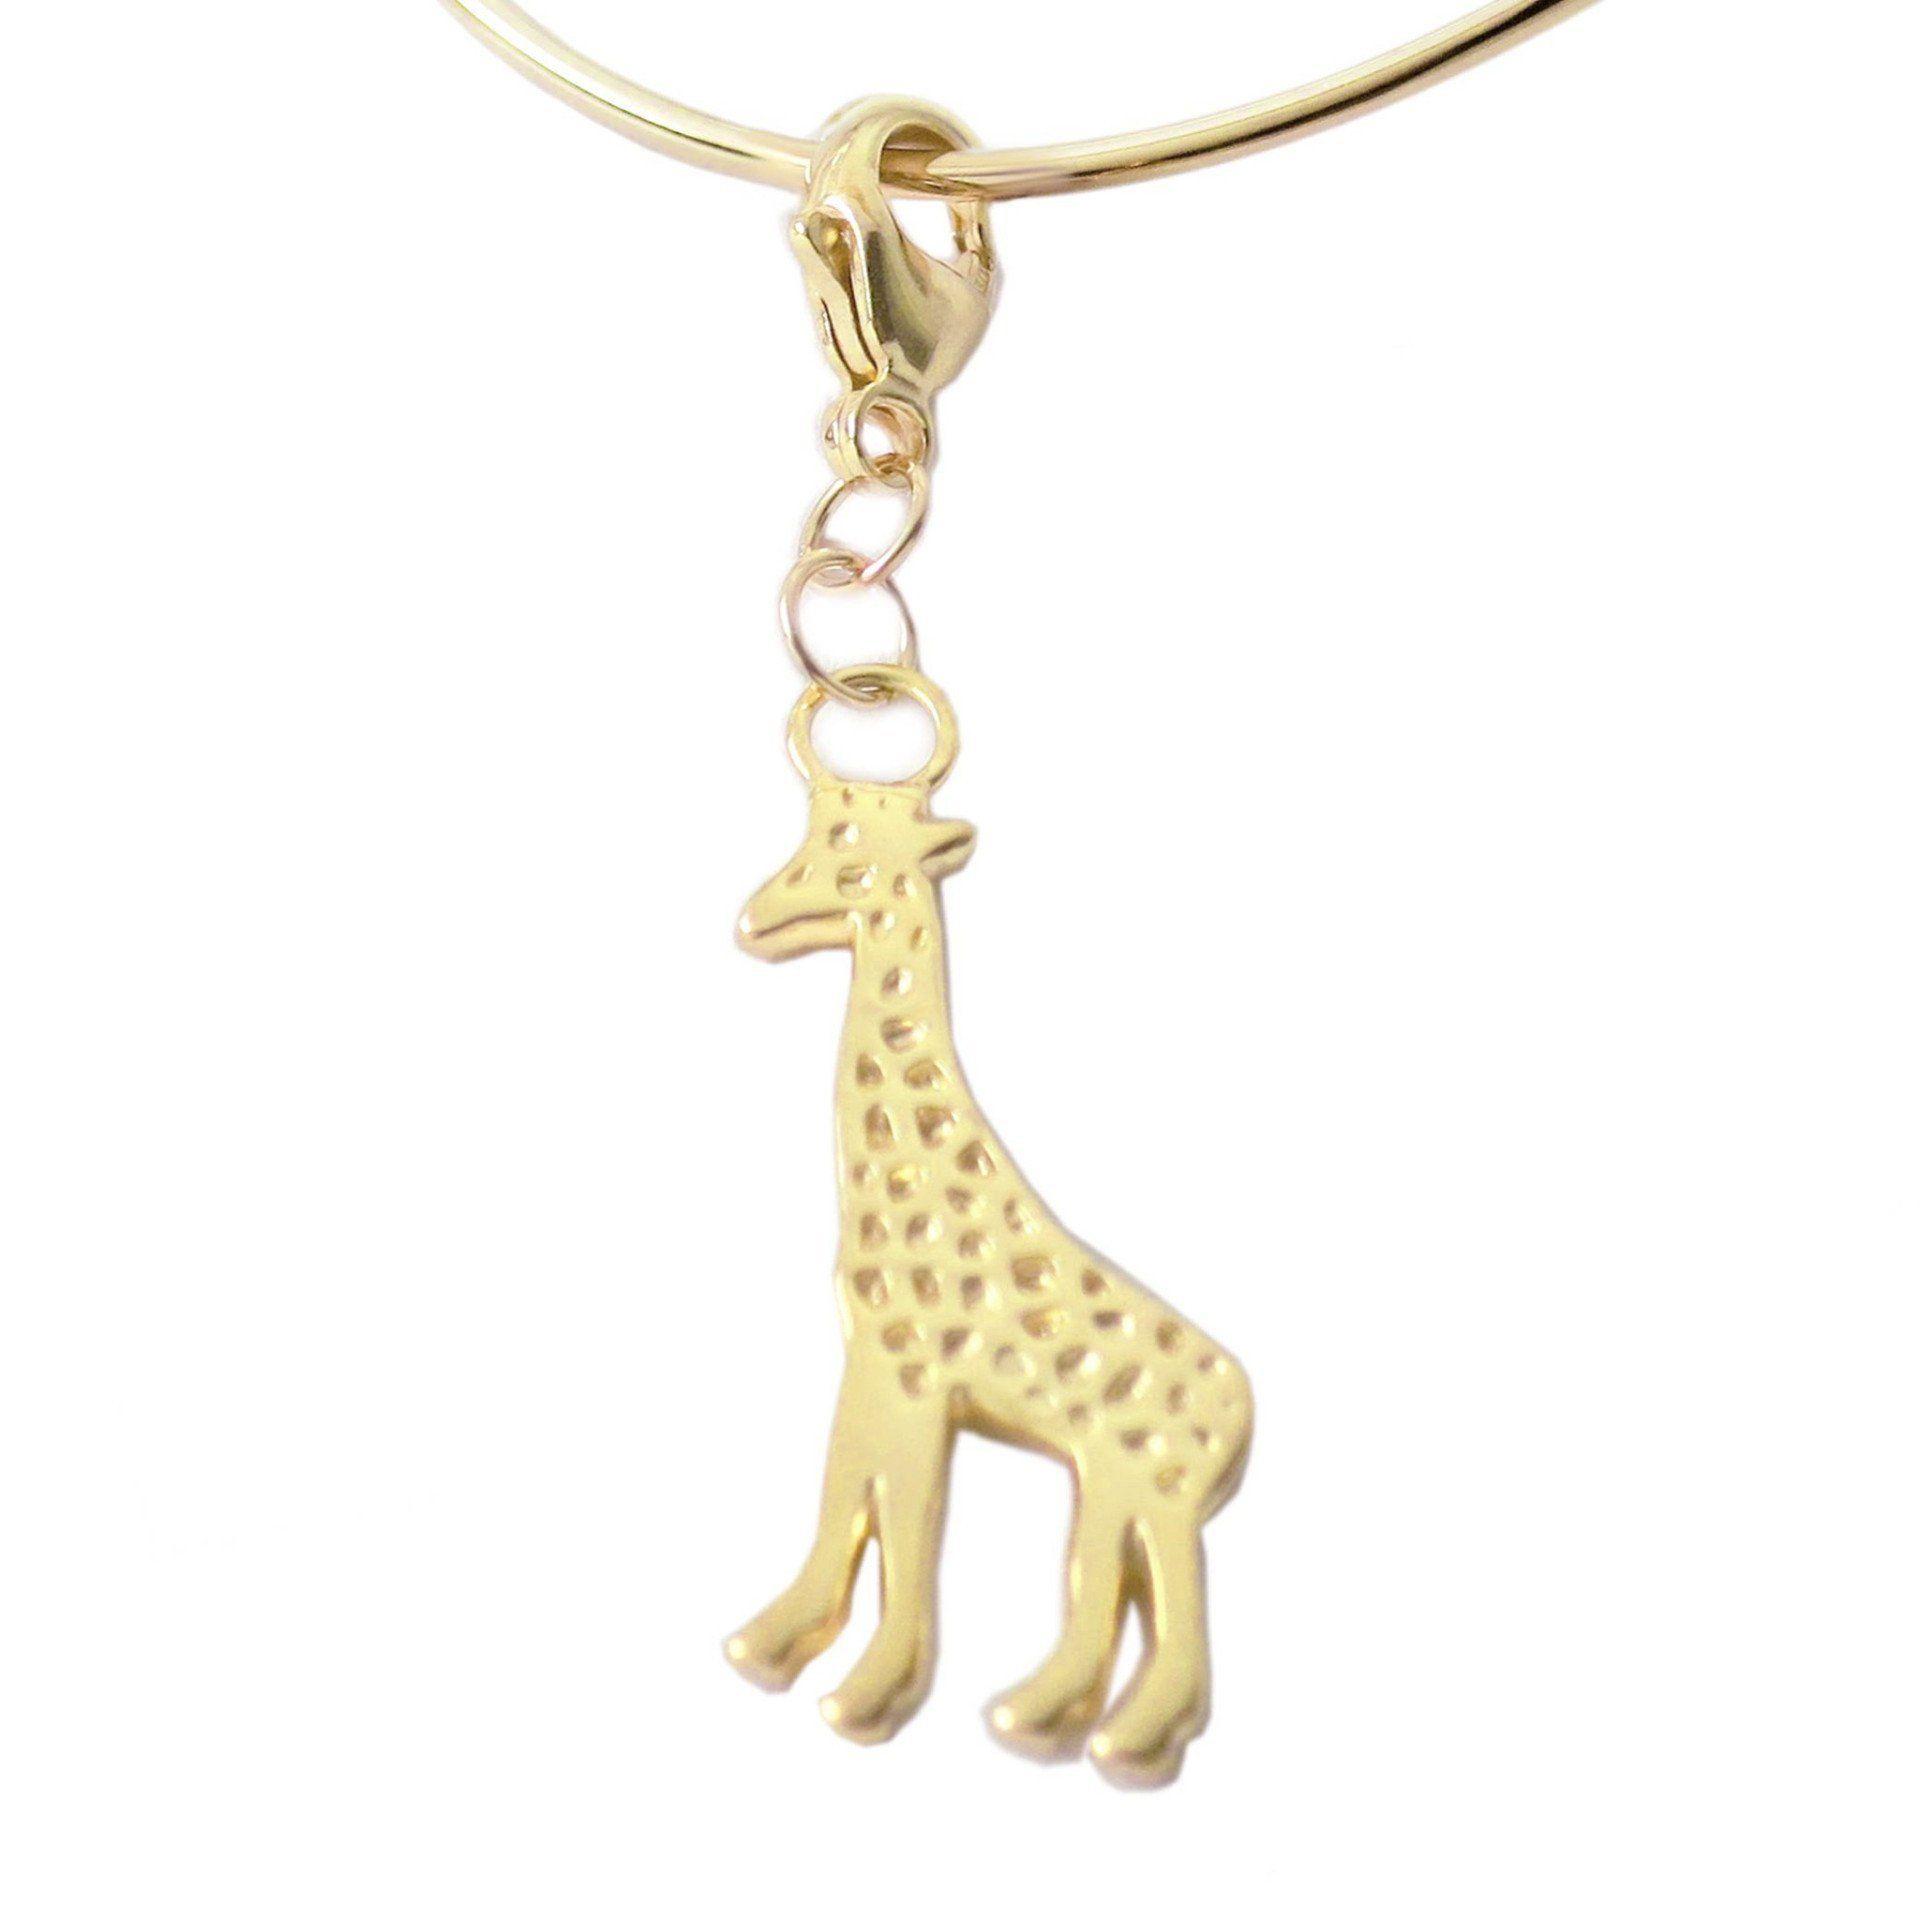 18k Gold Plated Sterling Silver Giraffe Charm